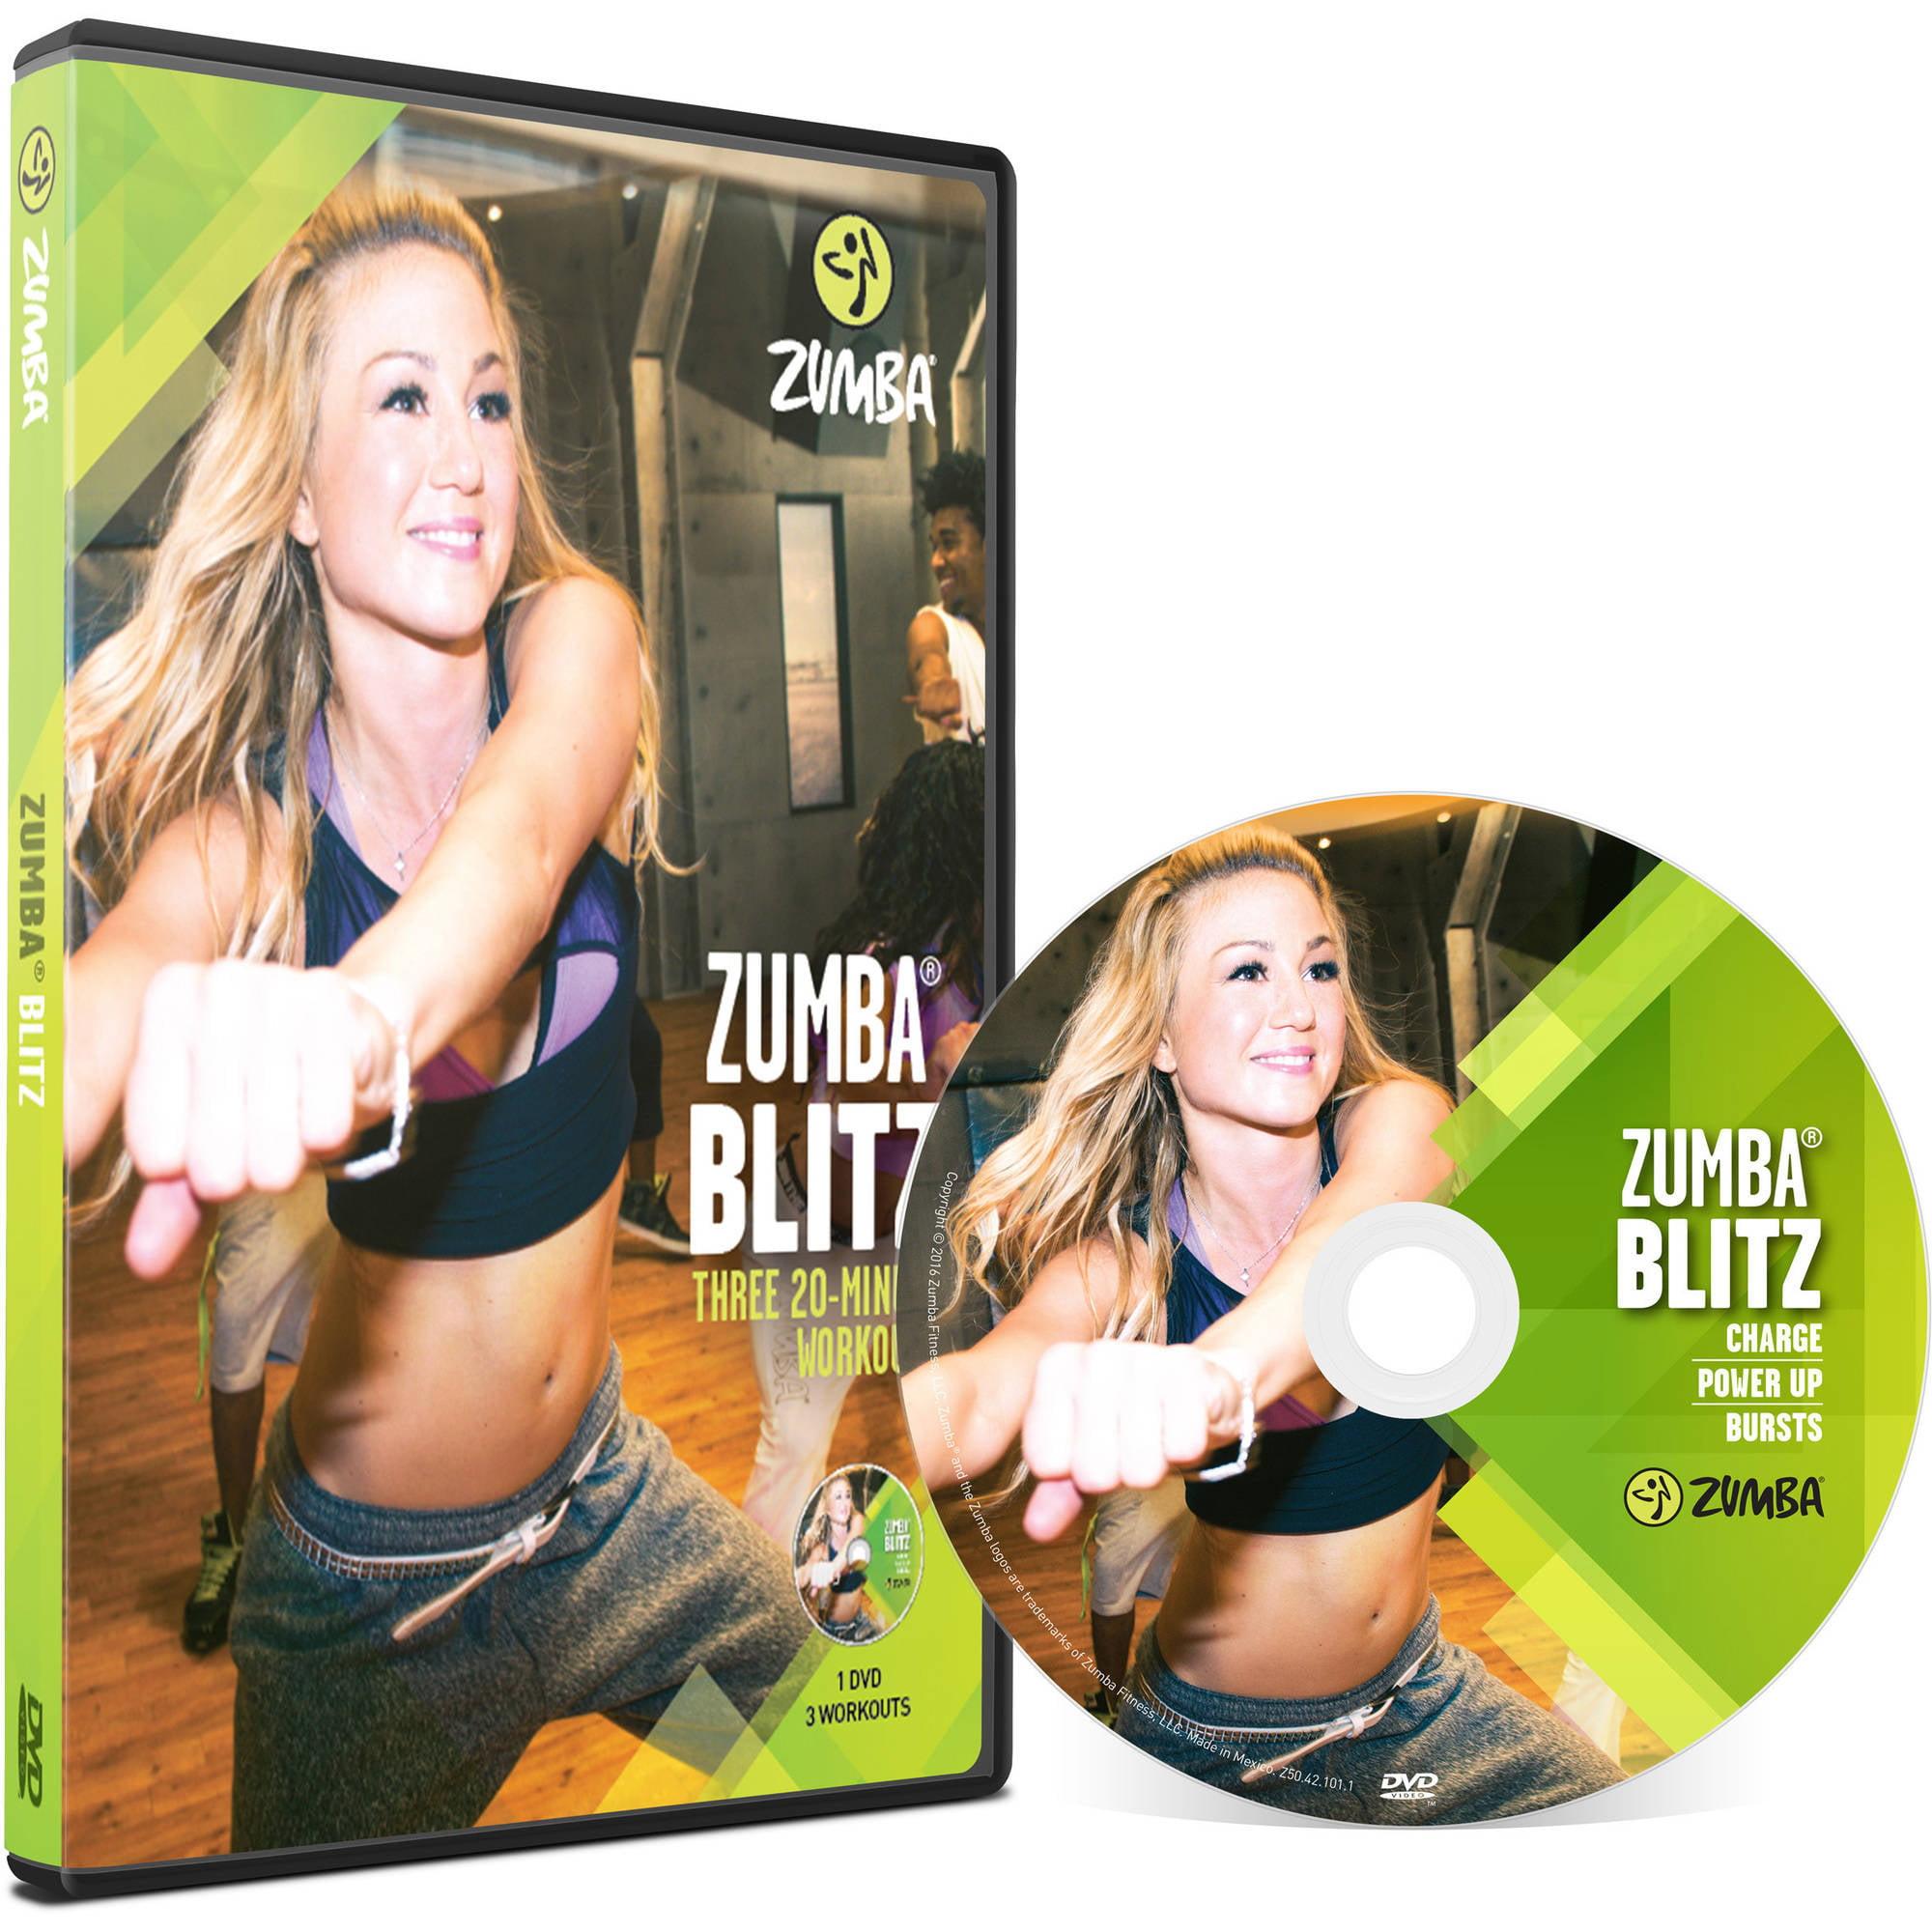 Zumba Blitz DVD by